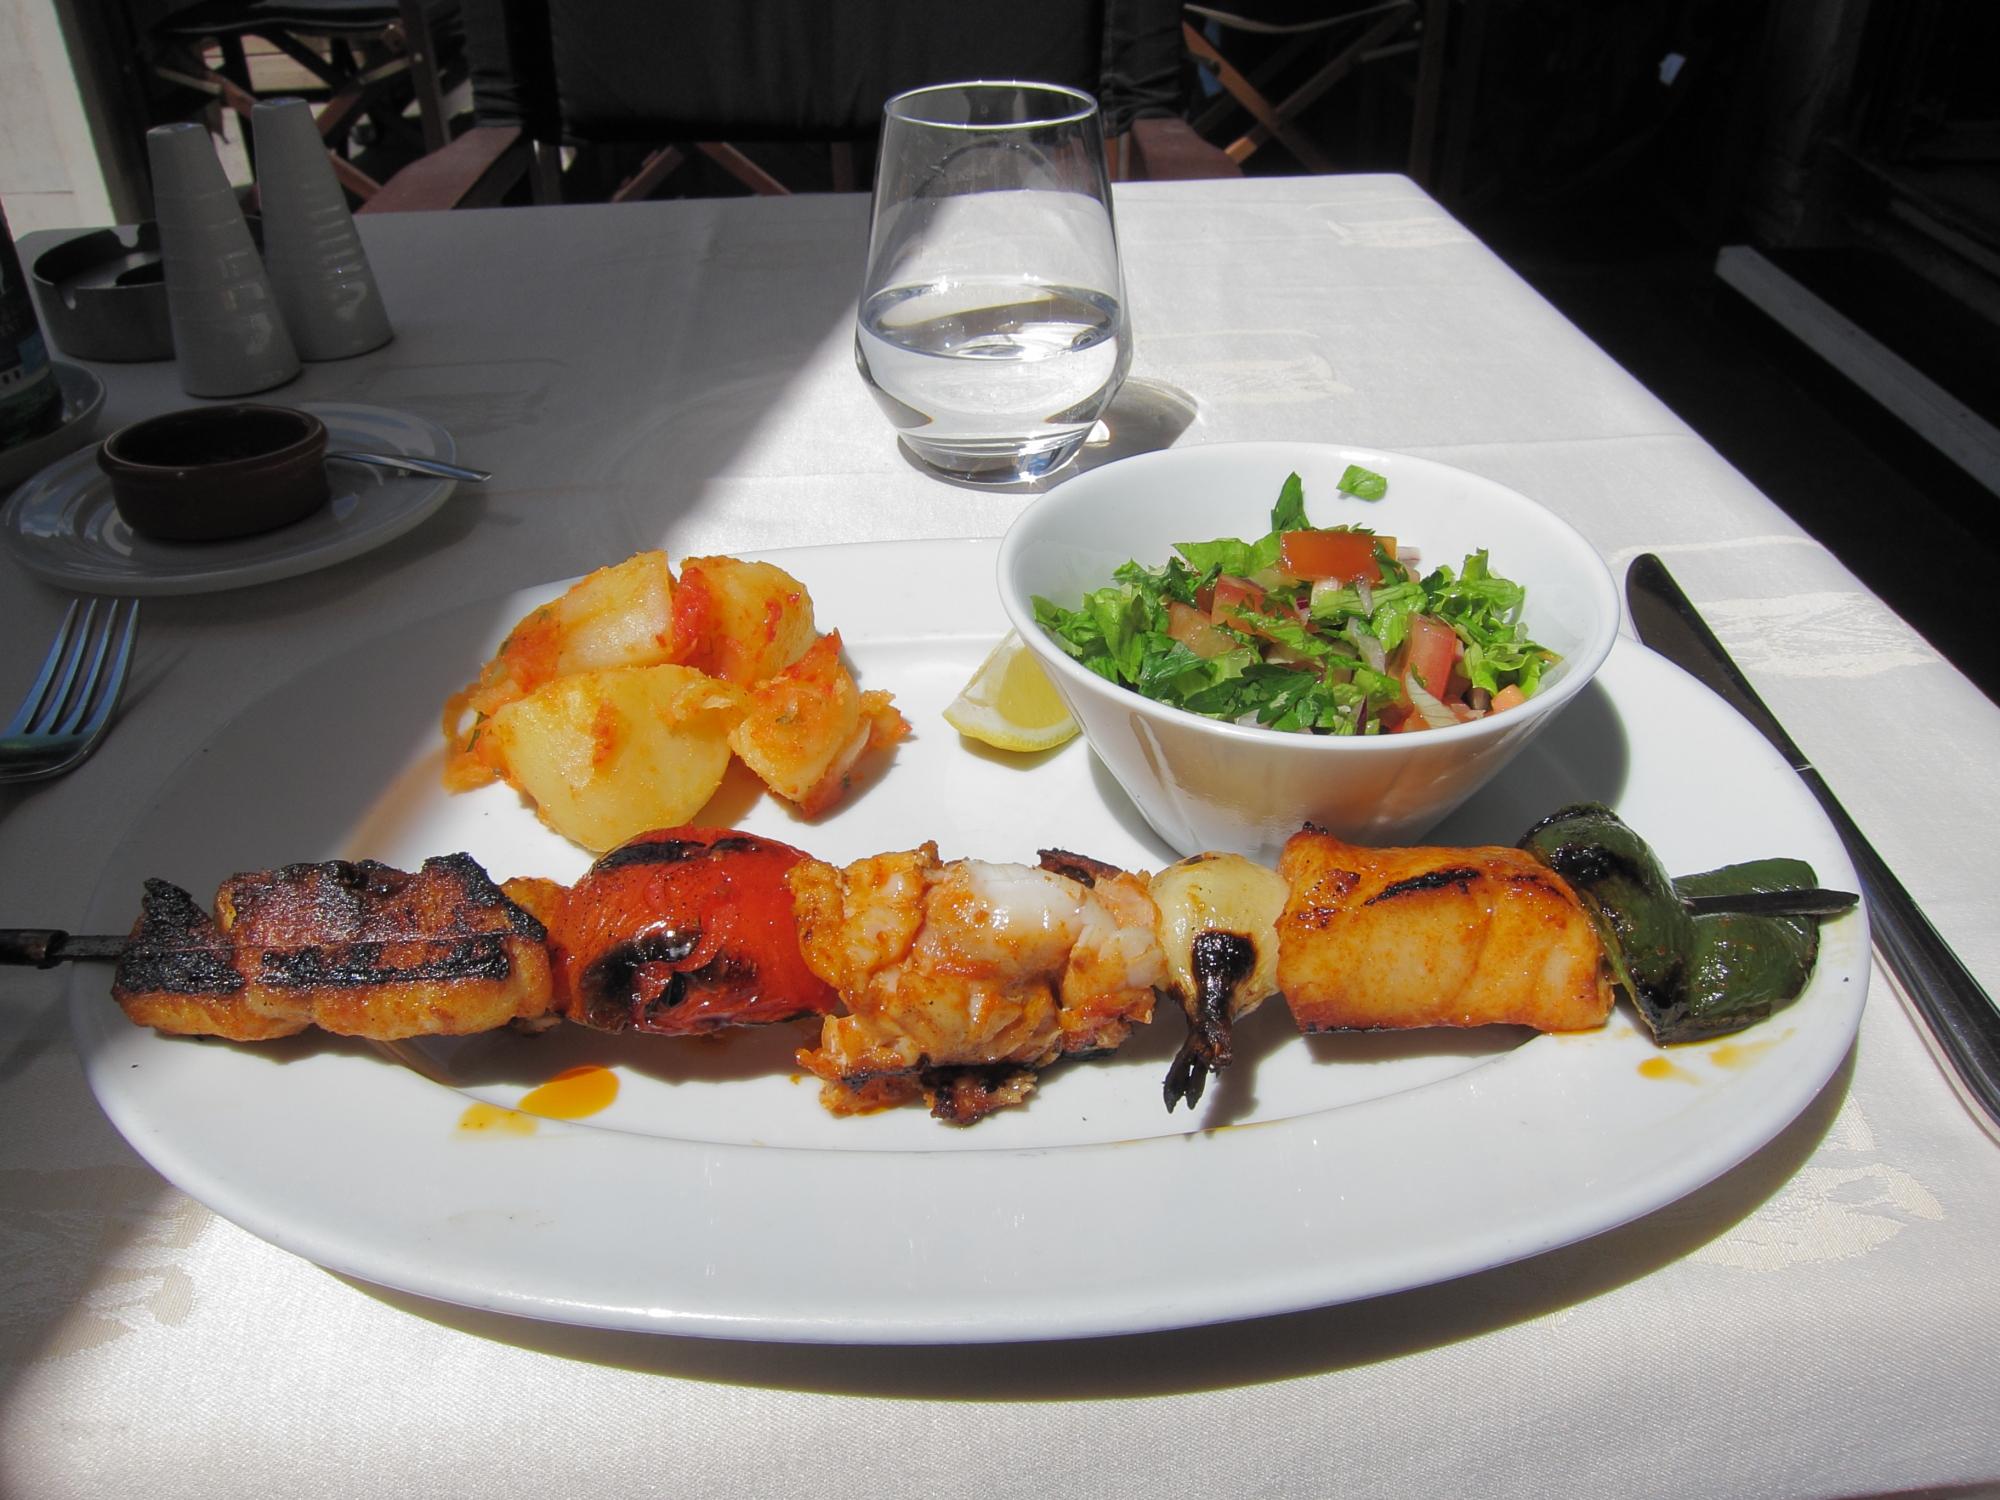 Delicious fish brochette platter at Le Janissaire, near métro Daumesnil.